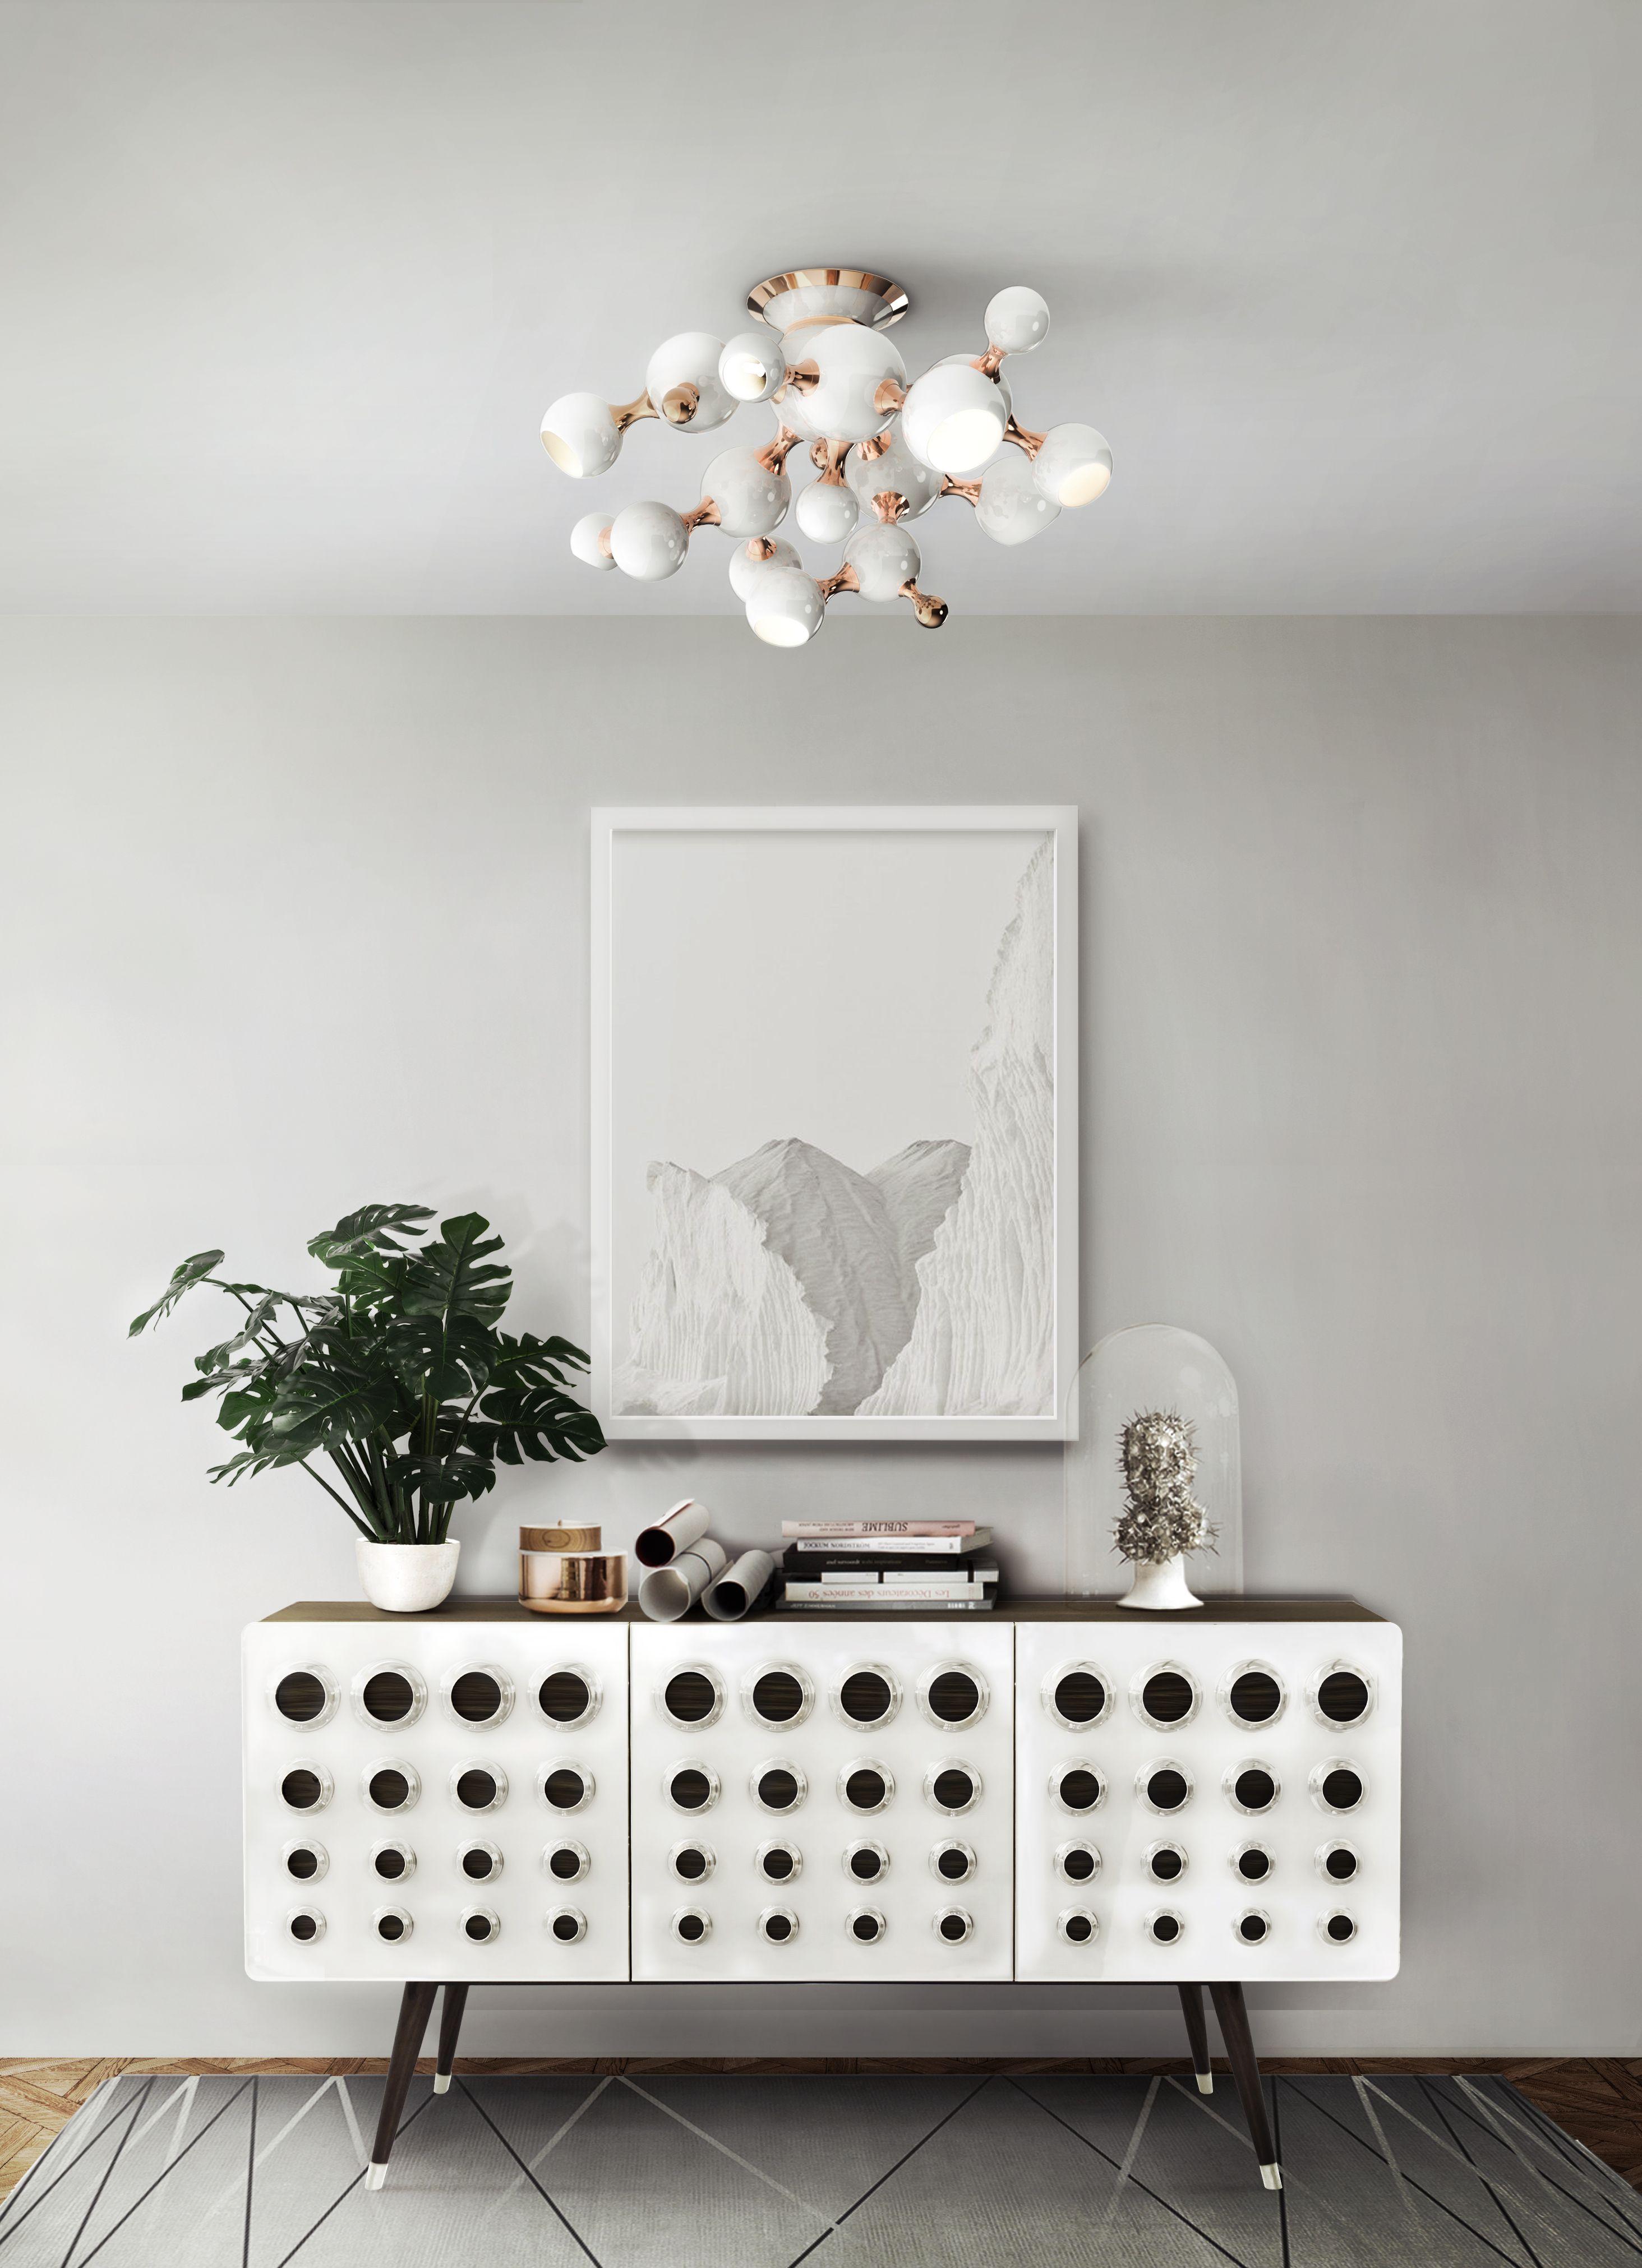 Find Out the Best Lighting Design to Brighten Up Your Hallway | www.modernfloorlamps.net #lightingdesign